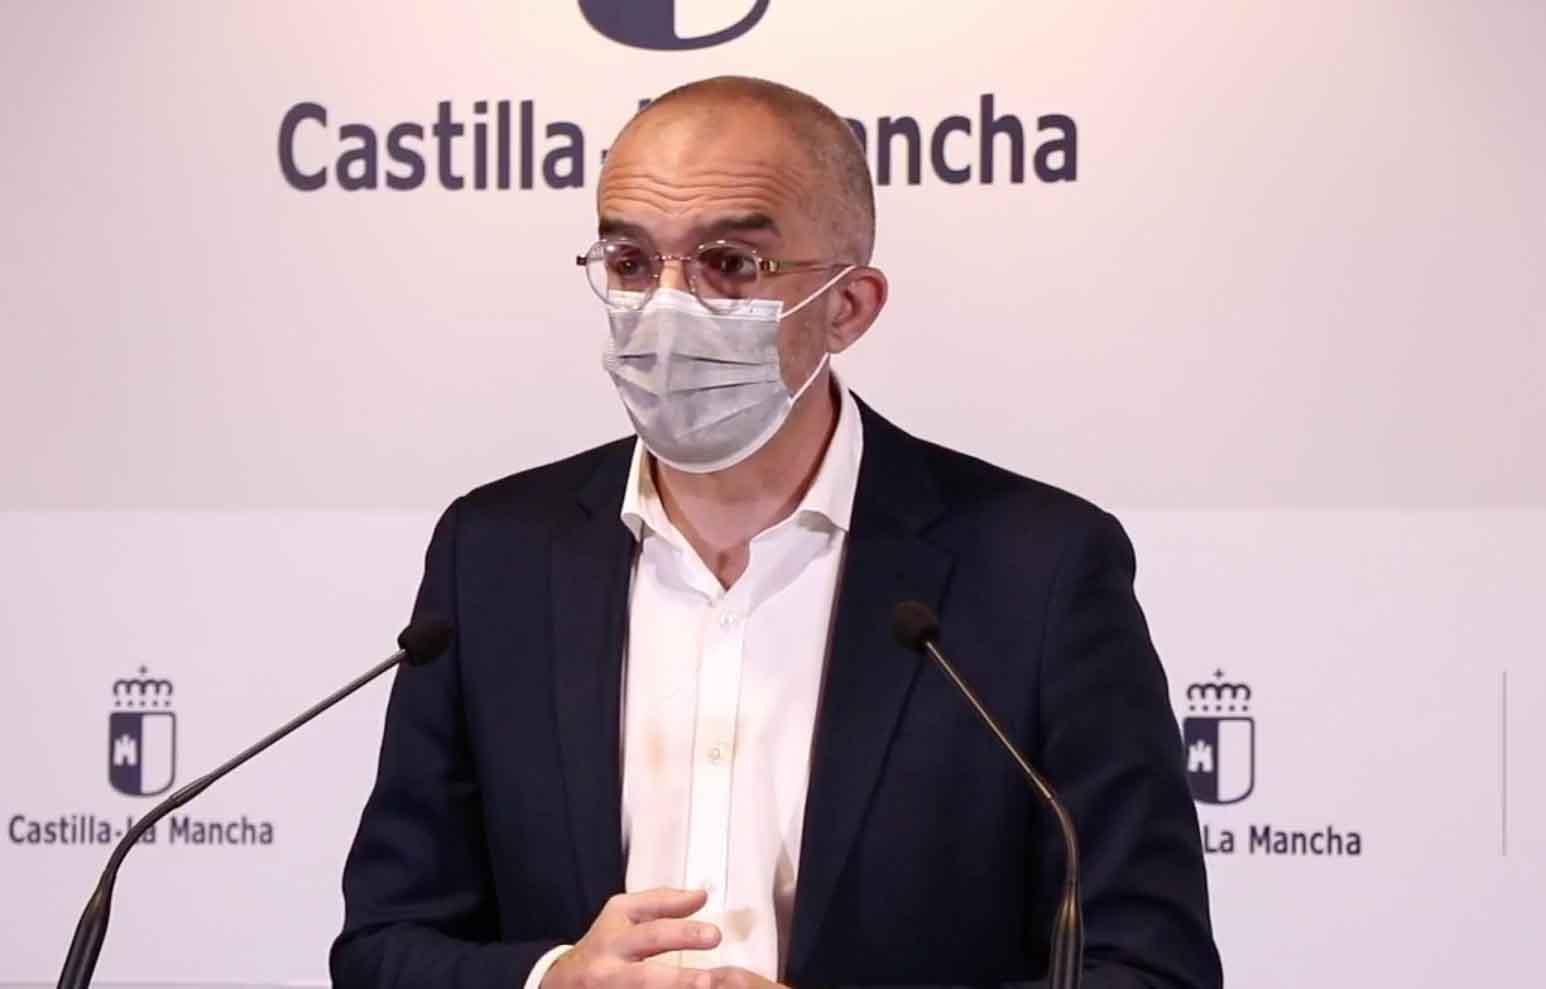 El director de Salud Pública de Castilla-La Mancha, Juan José Camacho.